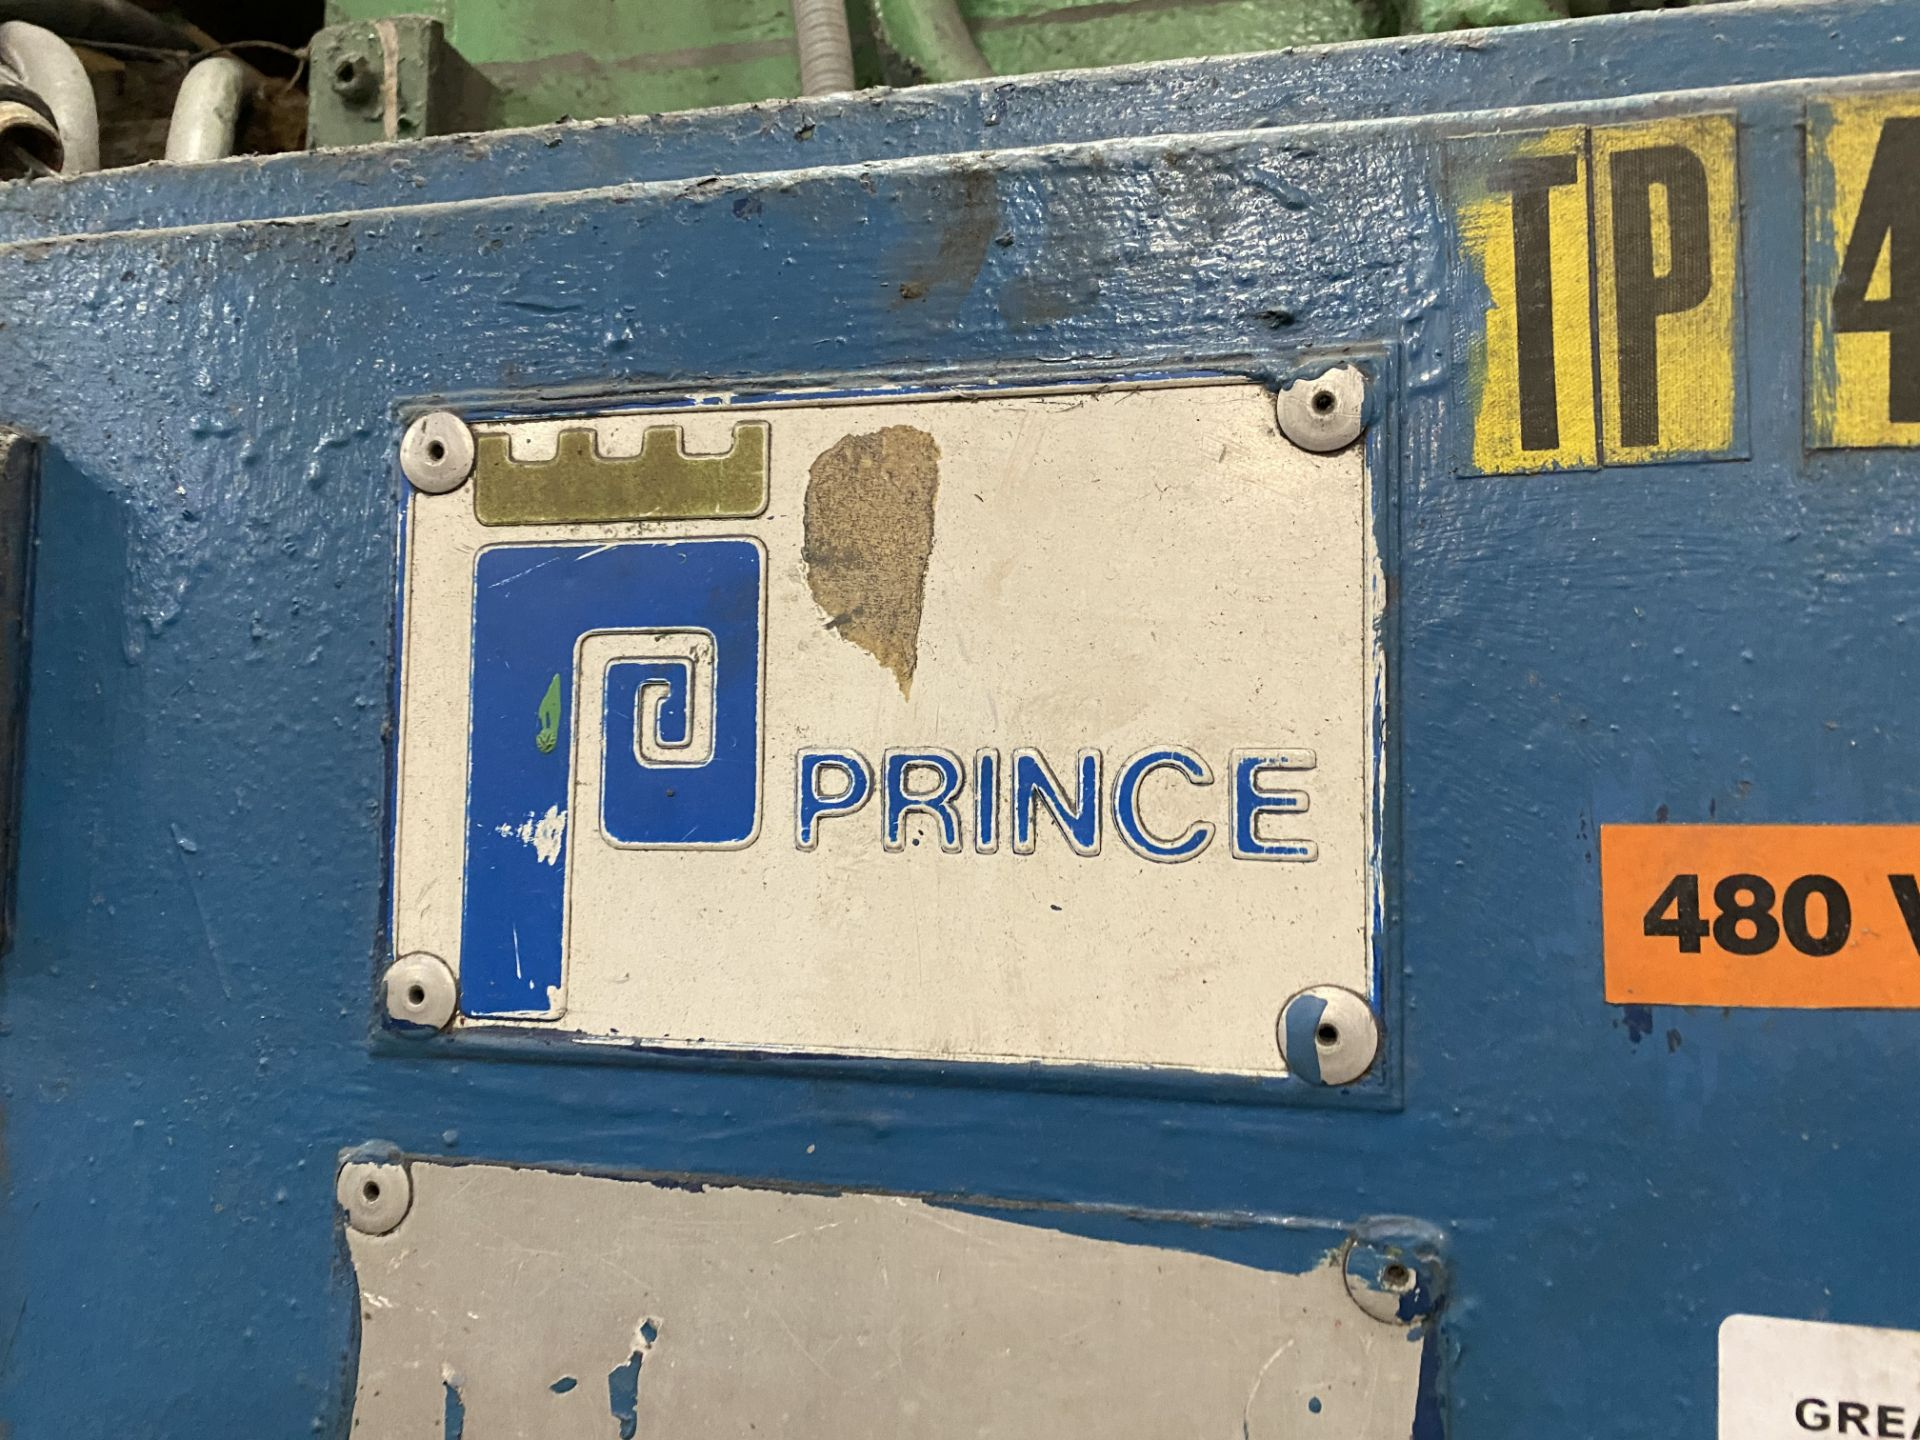 Prince Die Cast Trim Press - Image 3 of 8